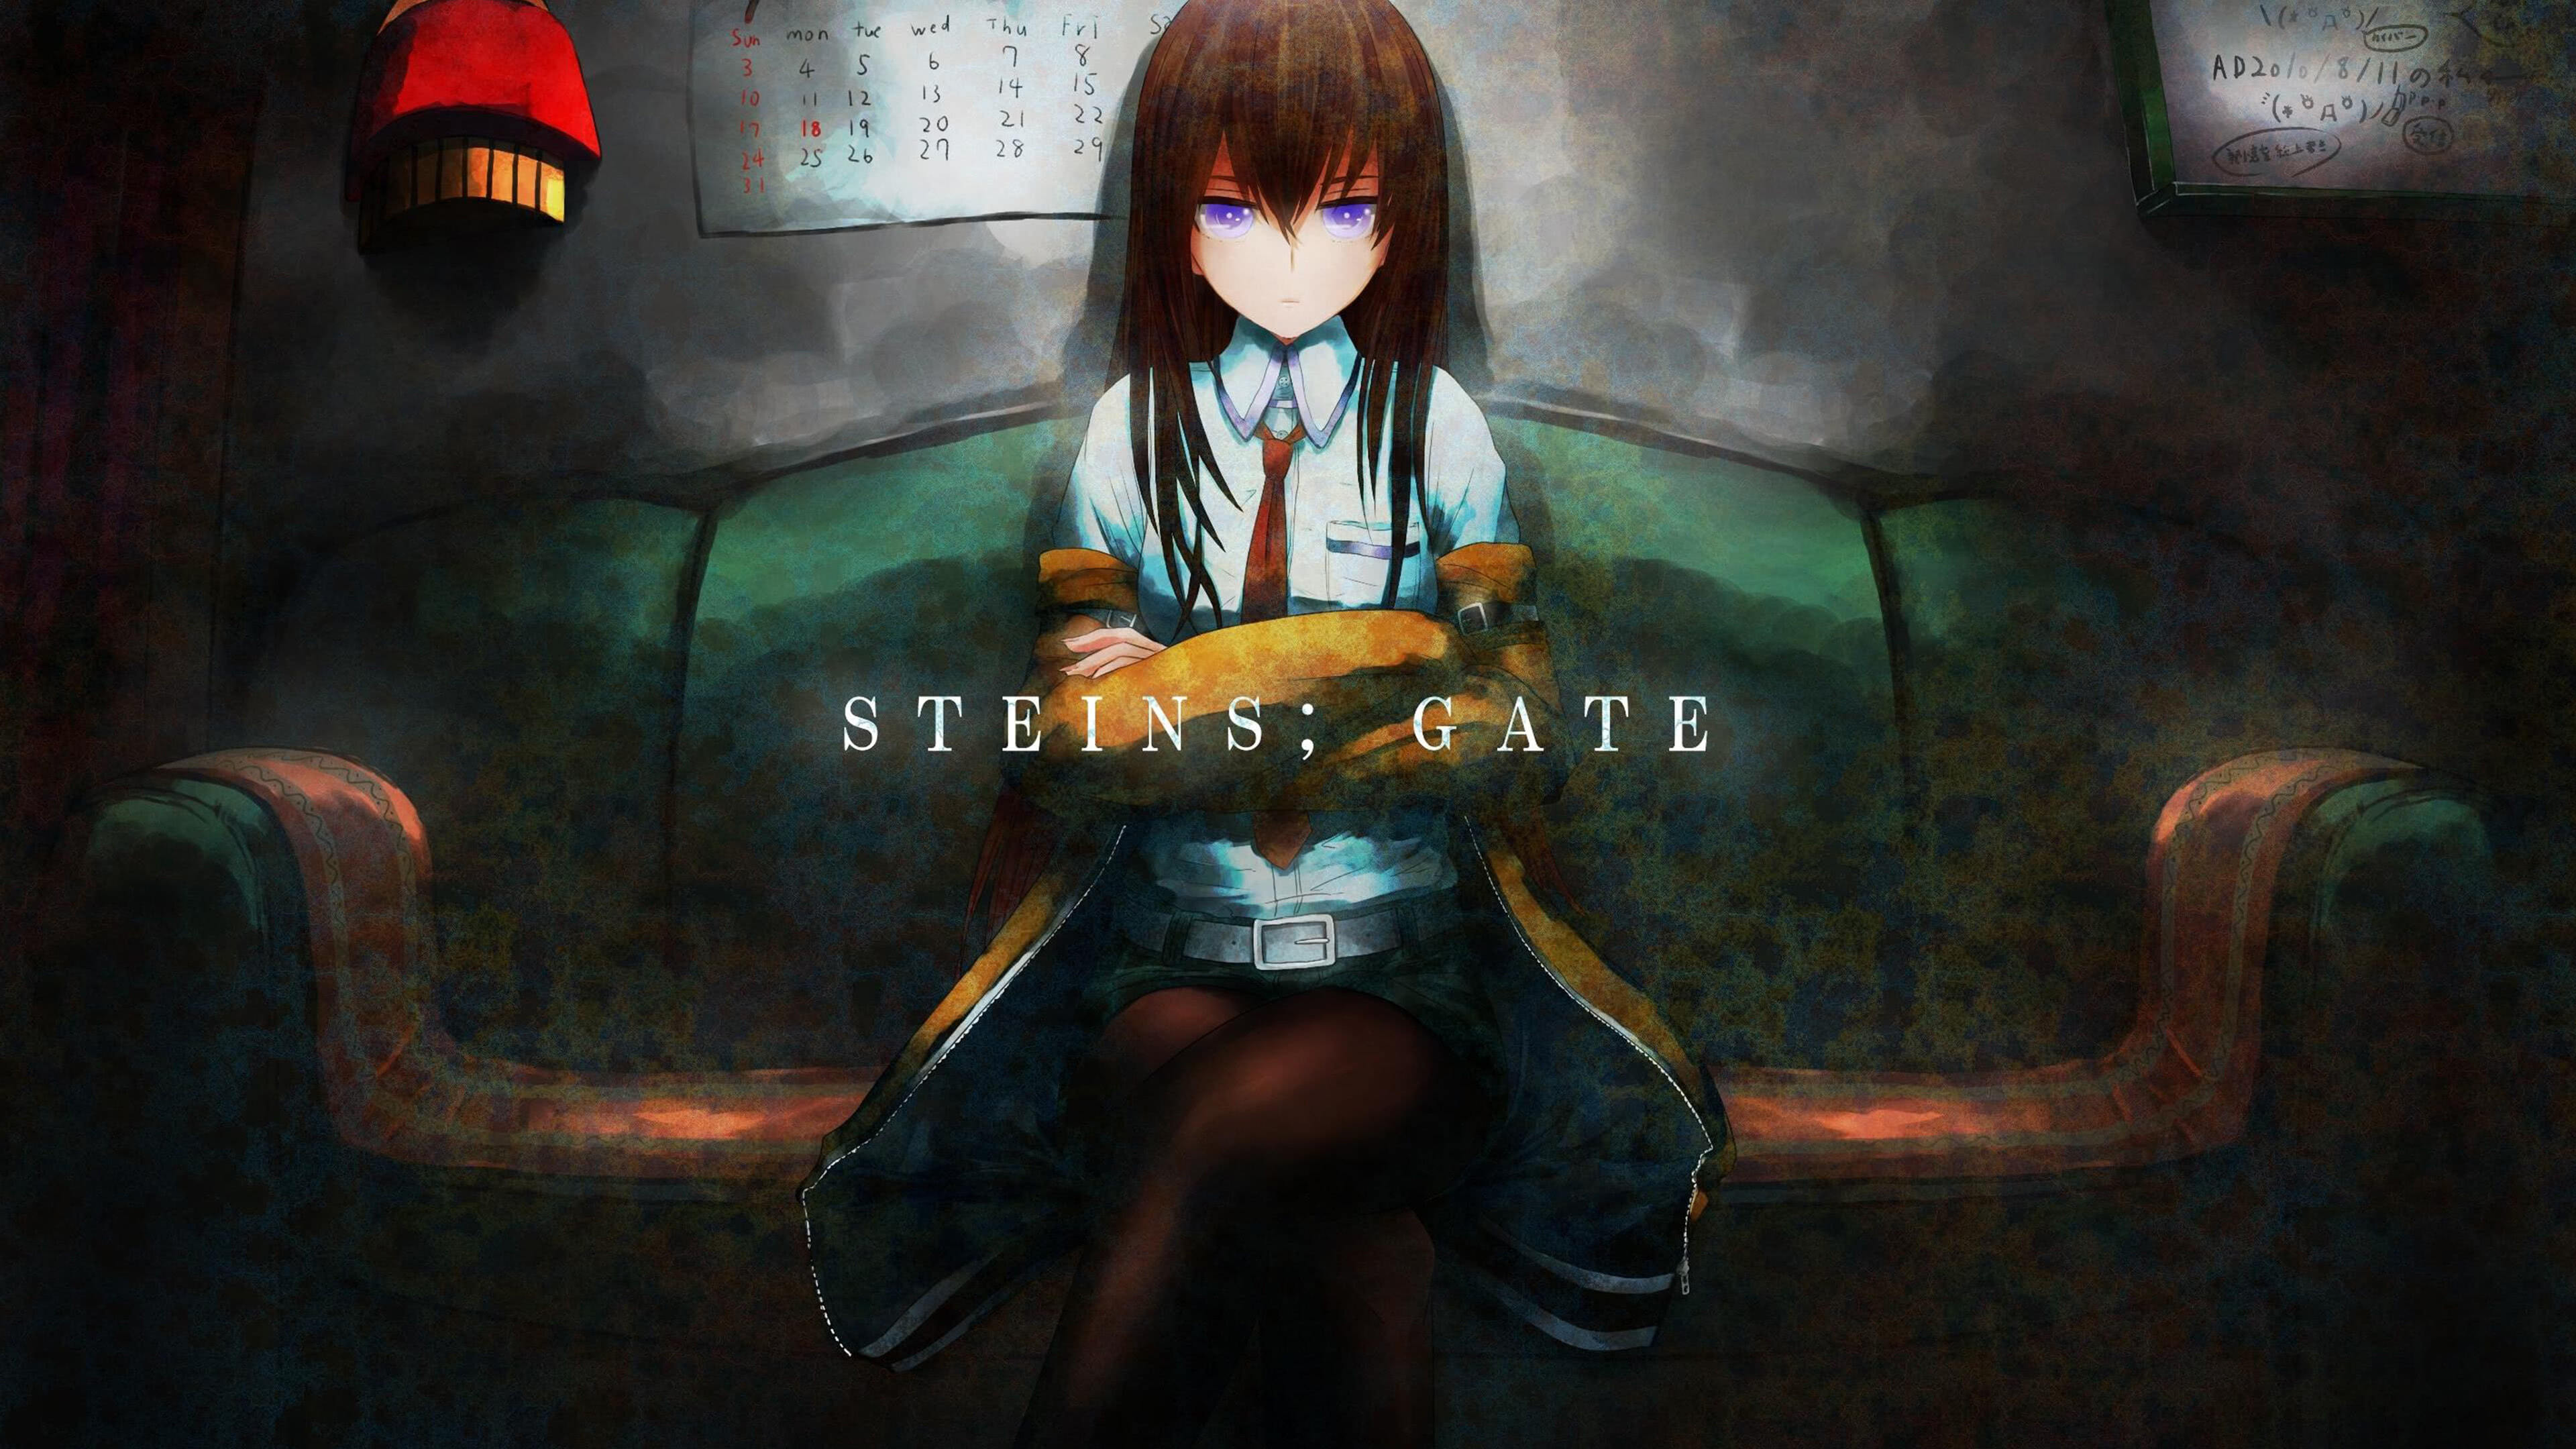 Steins Gate Elite Makise Kurisu UHD 4K Wallpaper | Pixelz